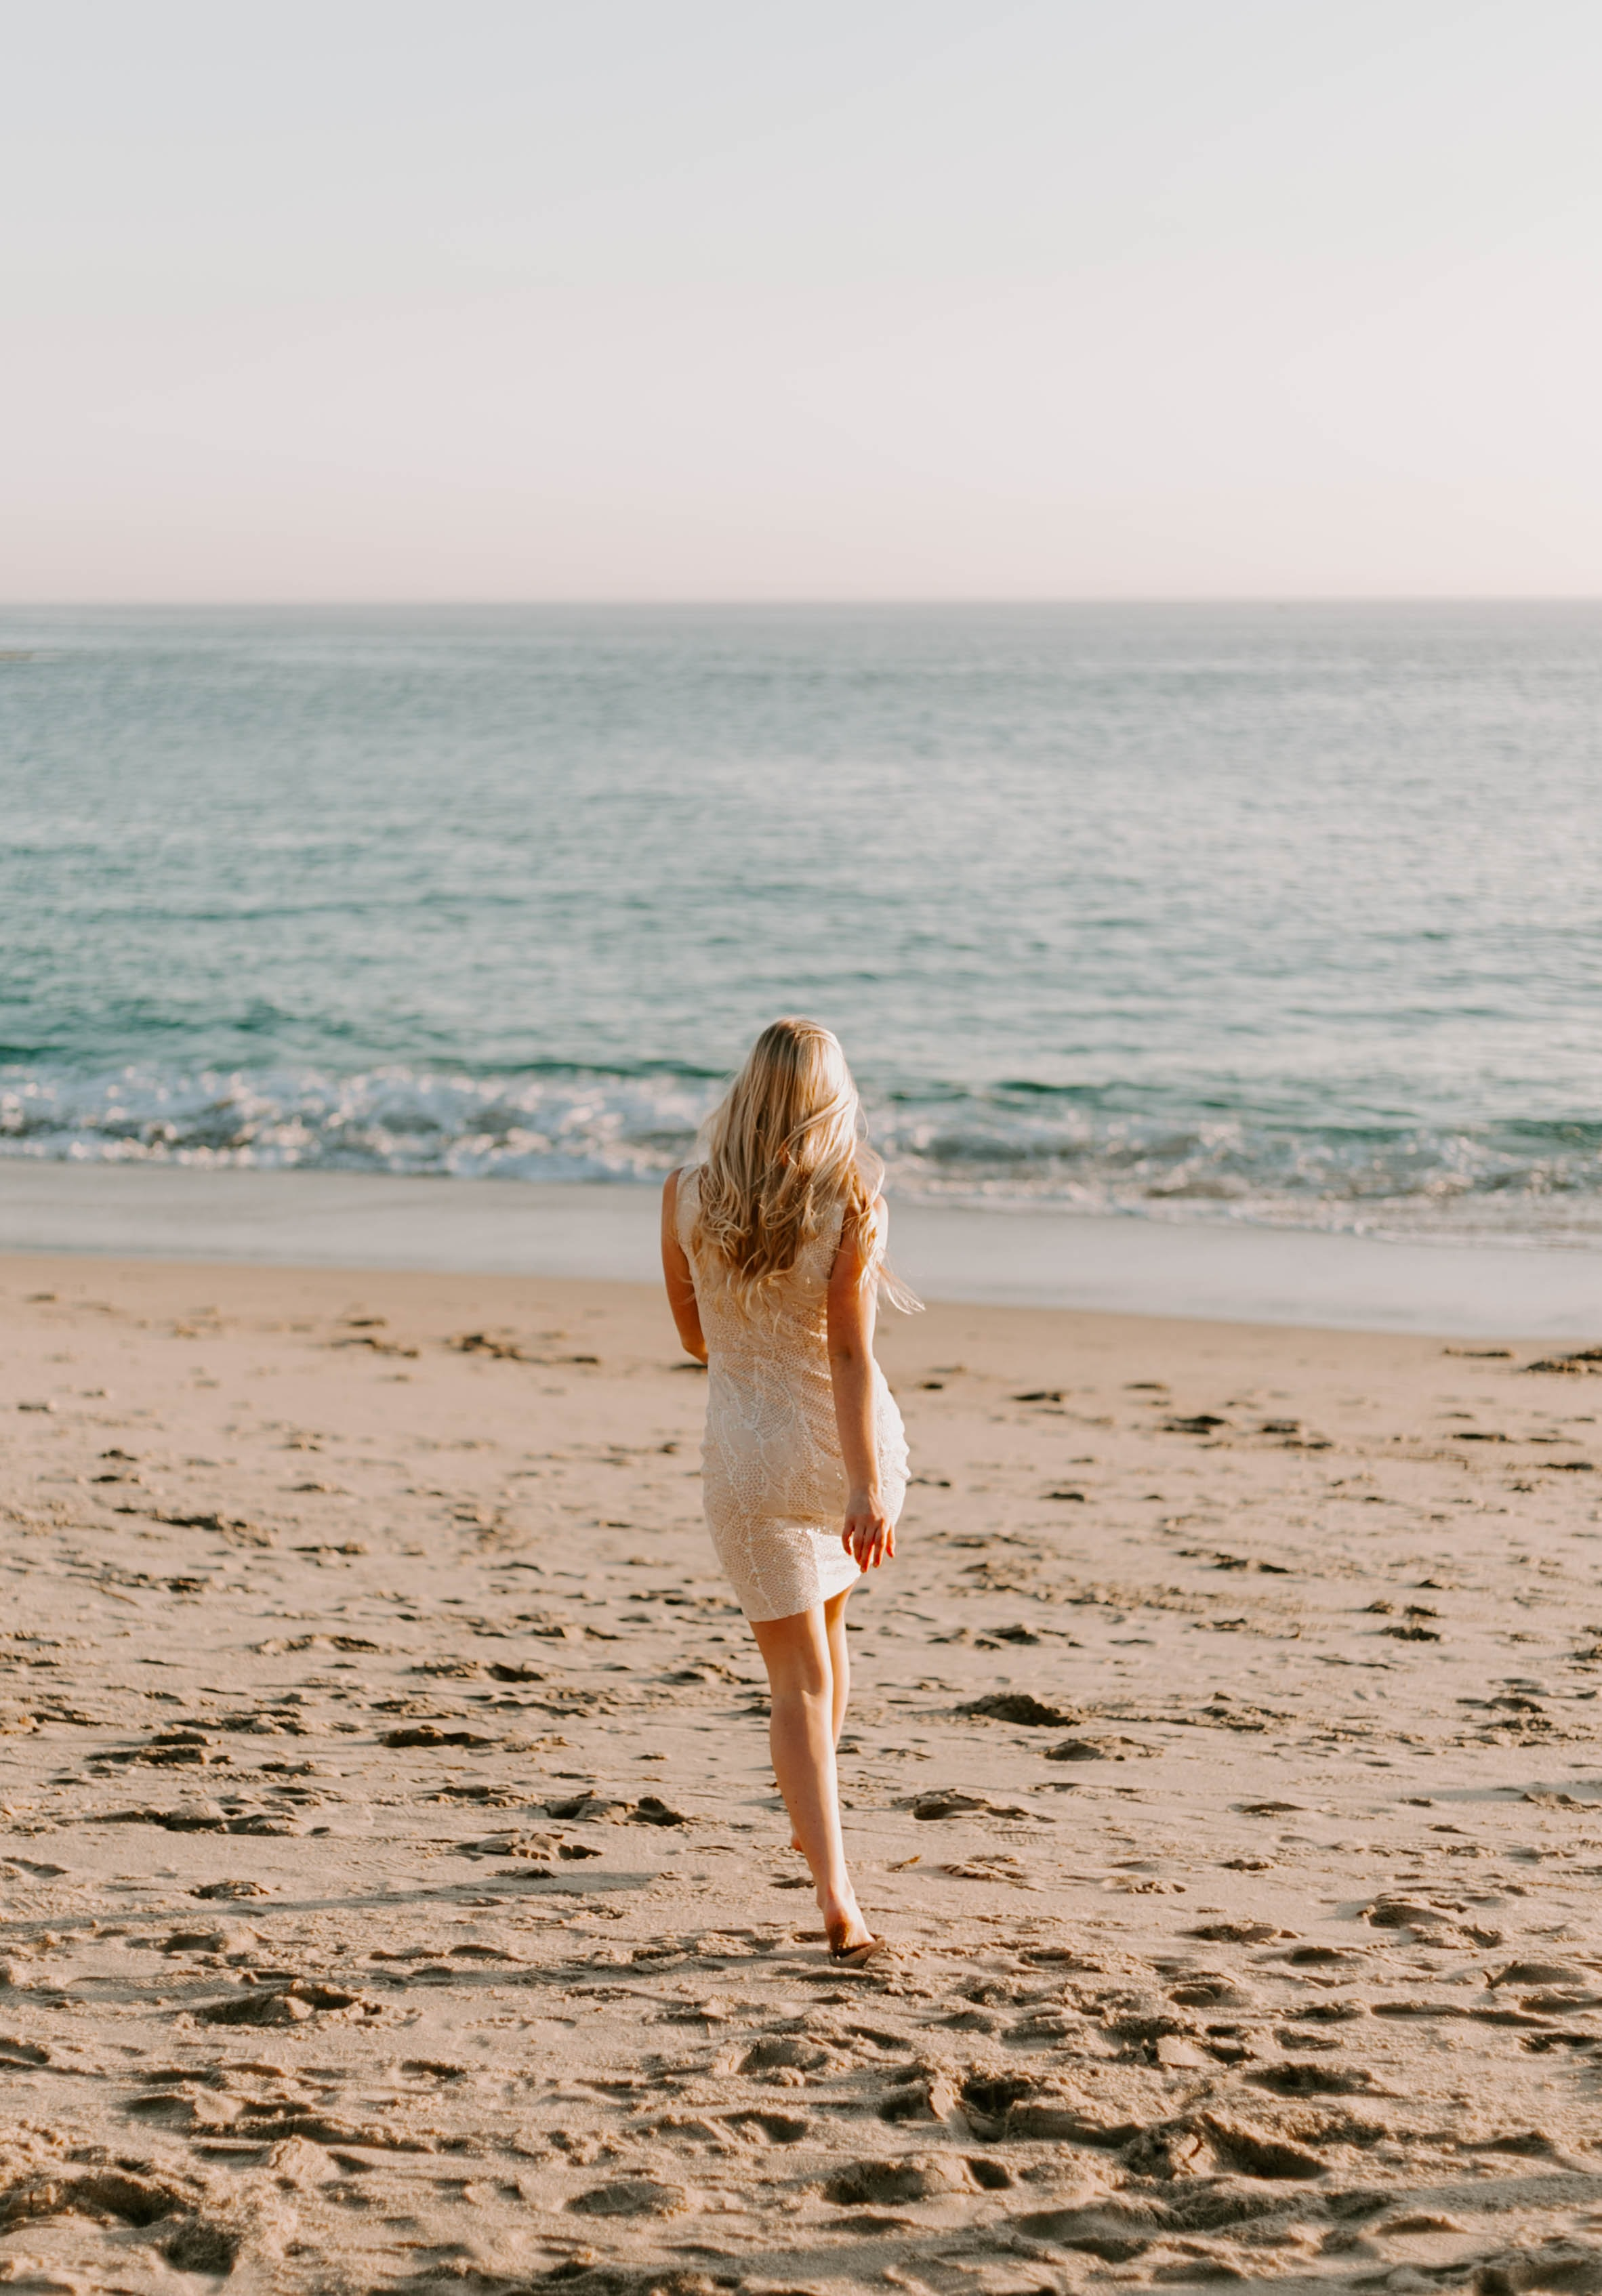 woman walking on beach overlooking sea during daytime